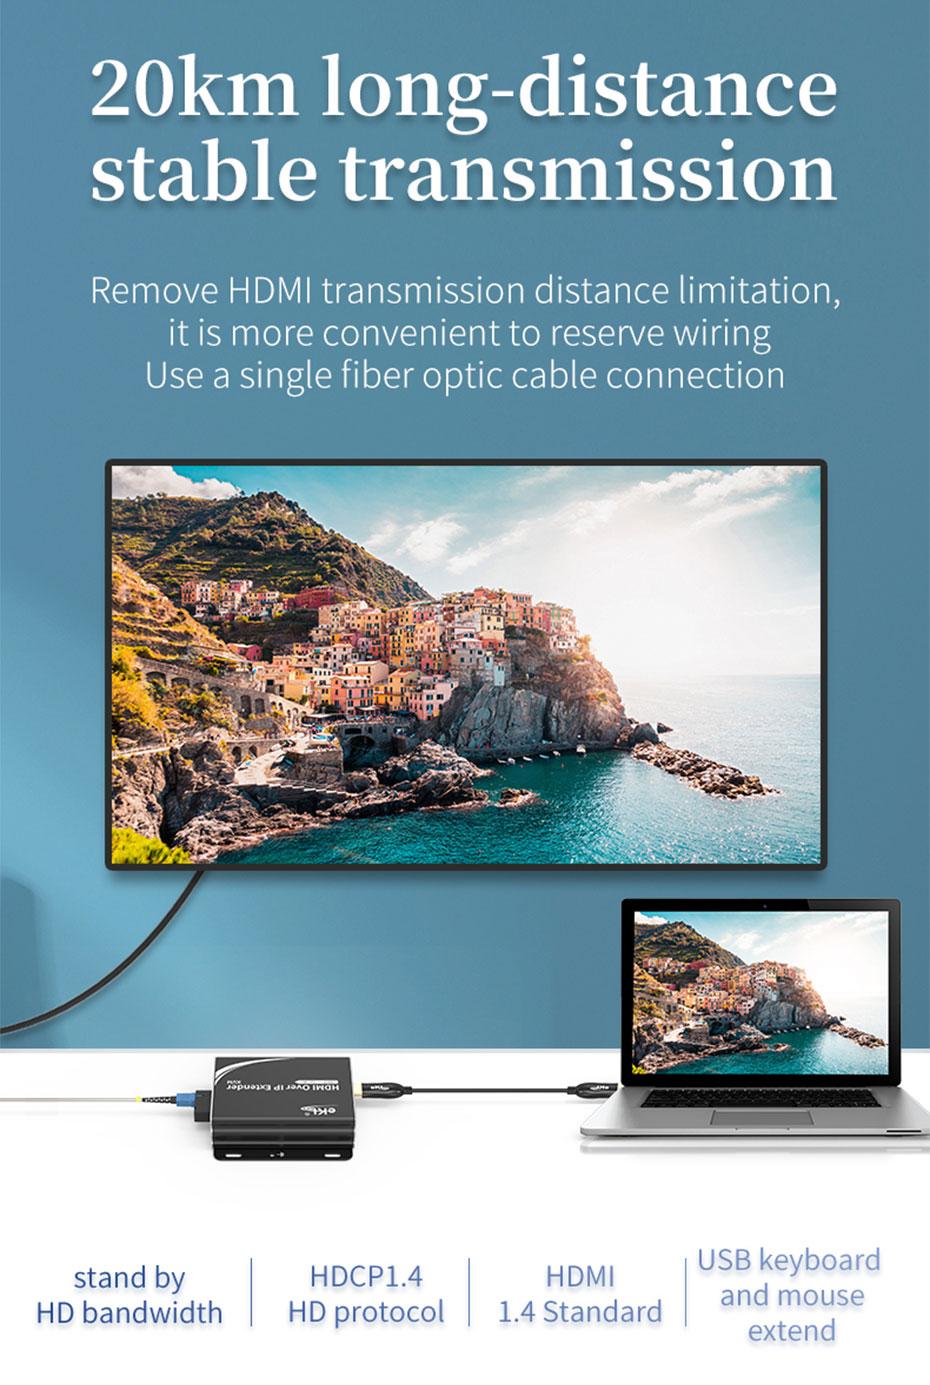 HDMI KVM optical fiber extender HE001 uses optical fiber cable to extend up to 20 kilometers